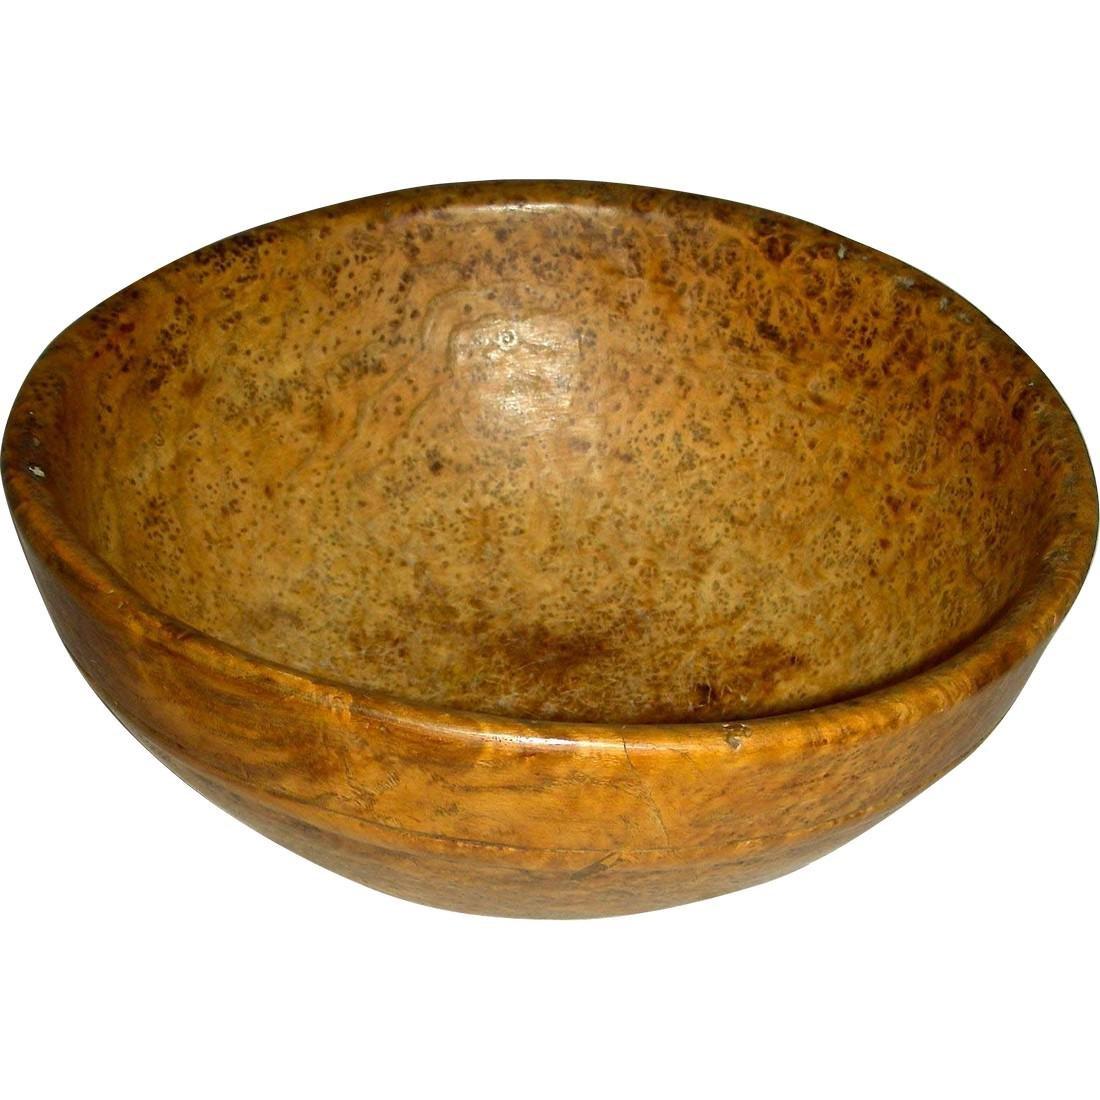 Small American Ash Burl Bowl, 19th century